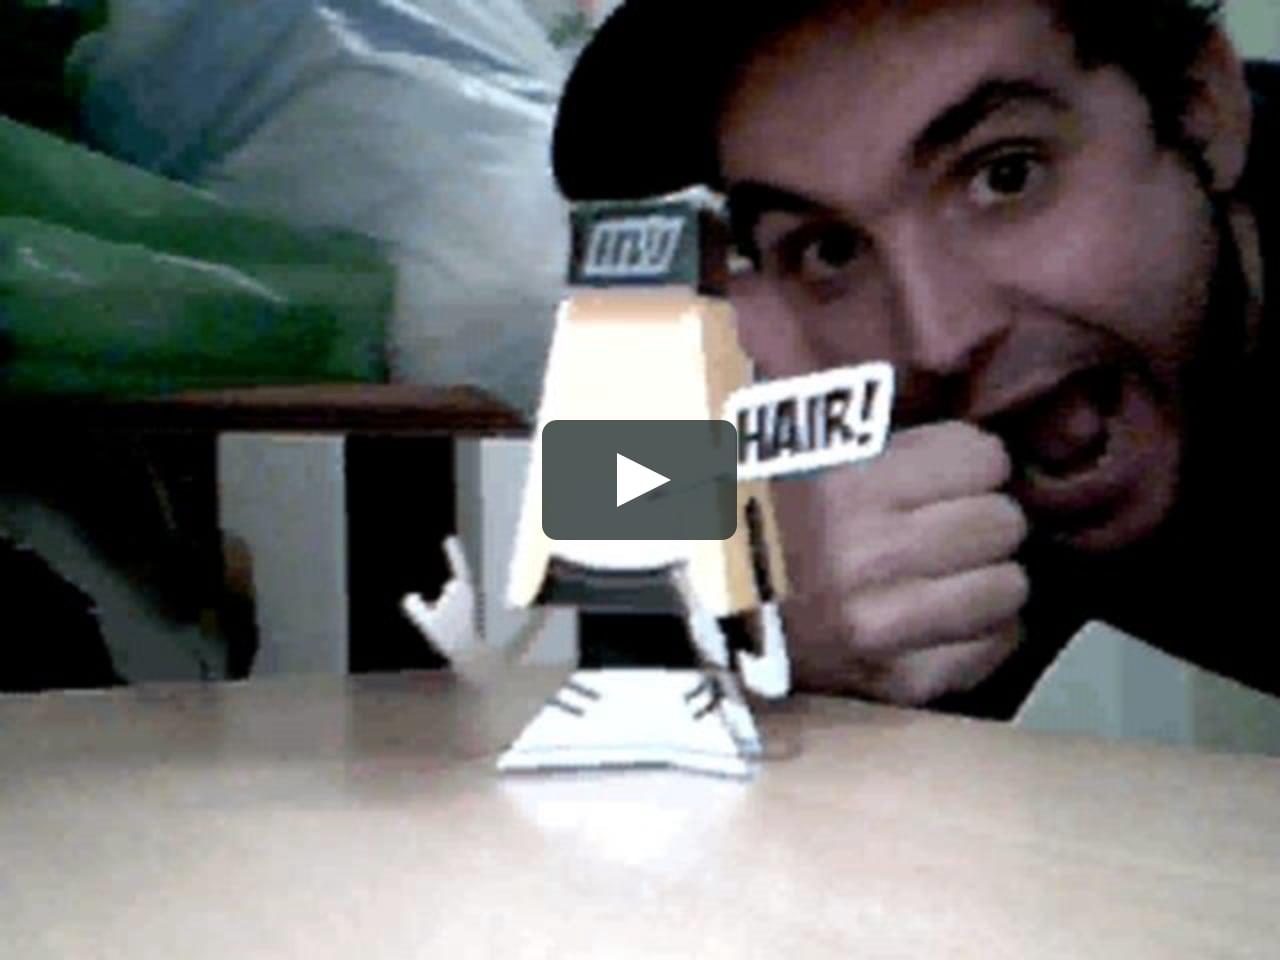 Papercraft Montando un papertoy: Hair